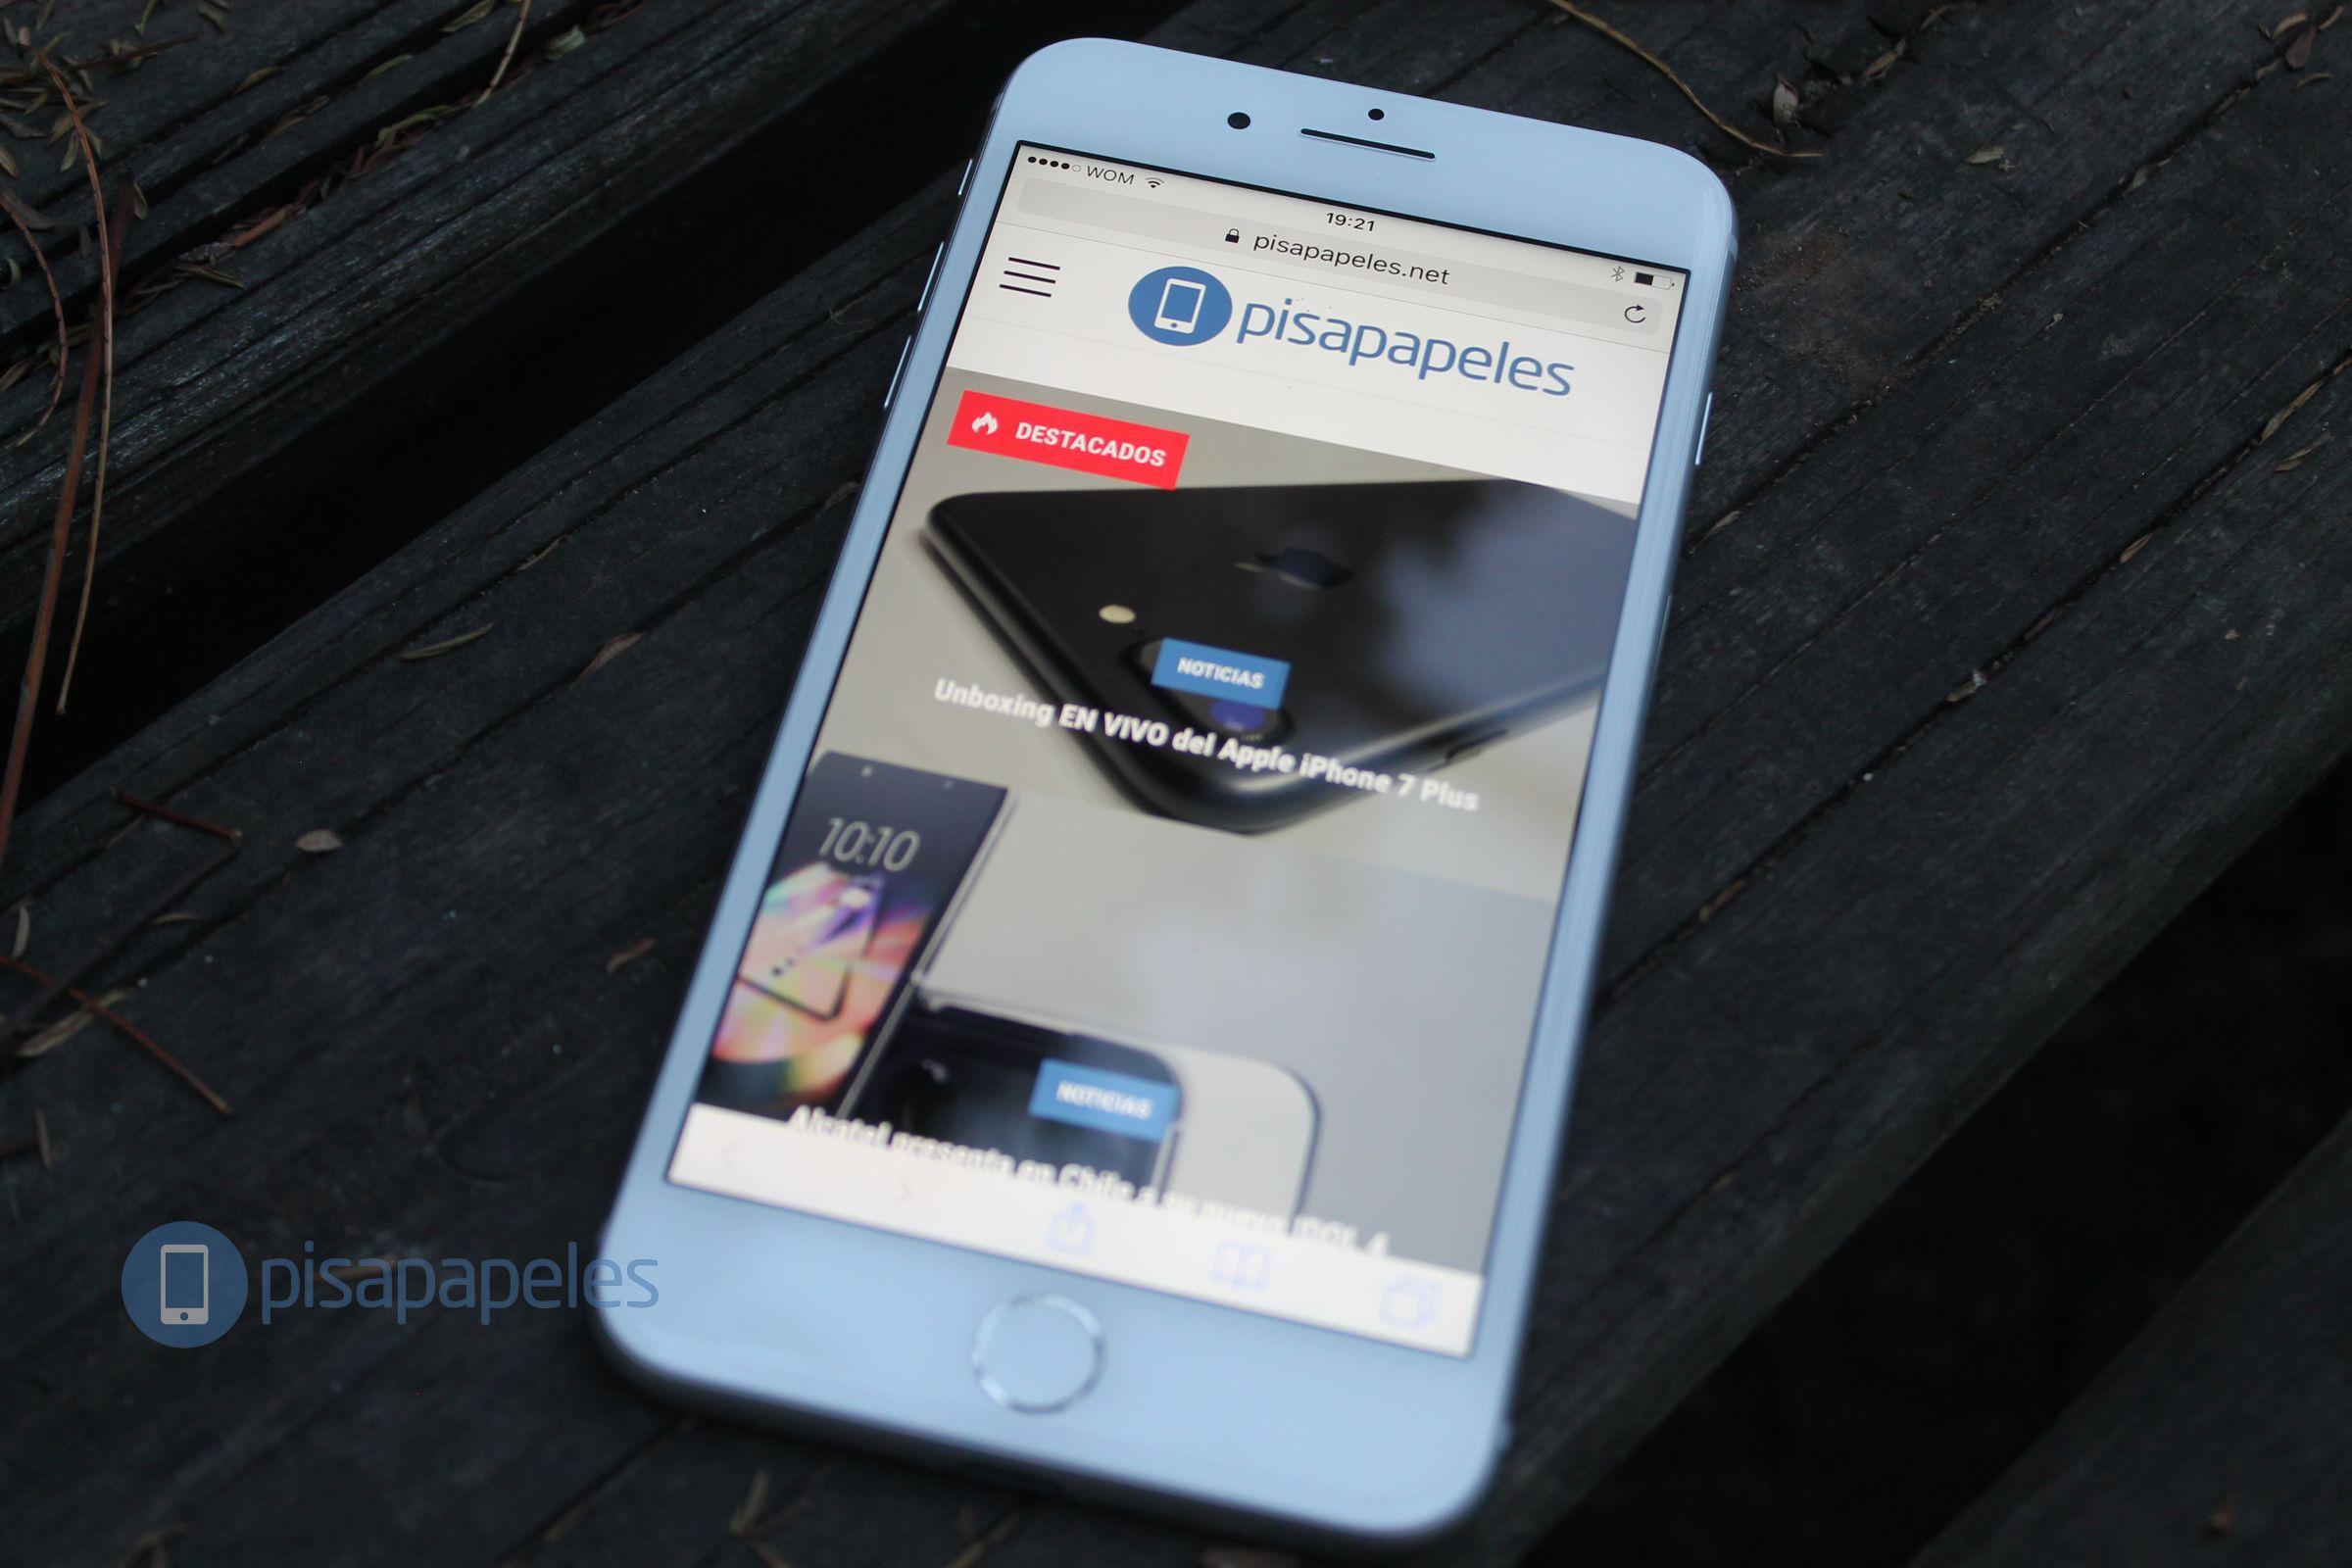 apple-iphone-7-plus-pisapapeles-net_27